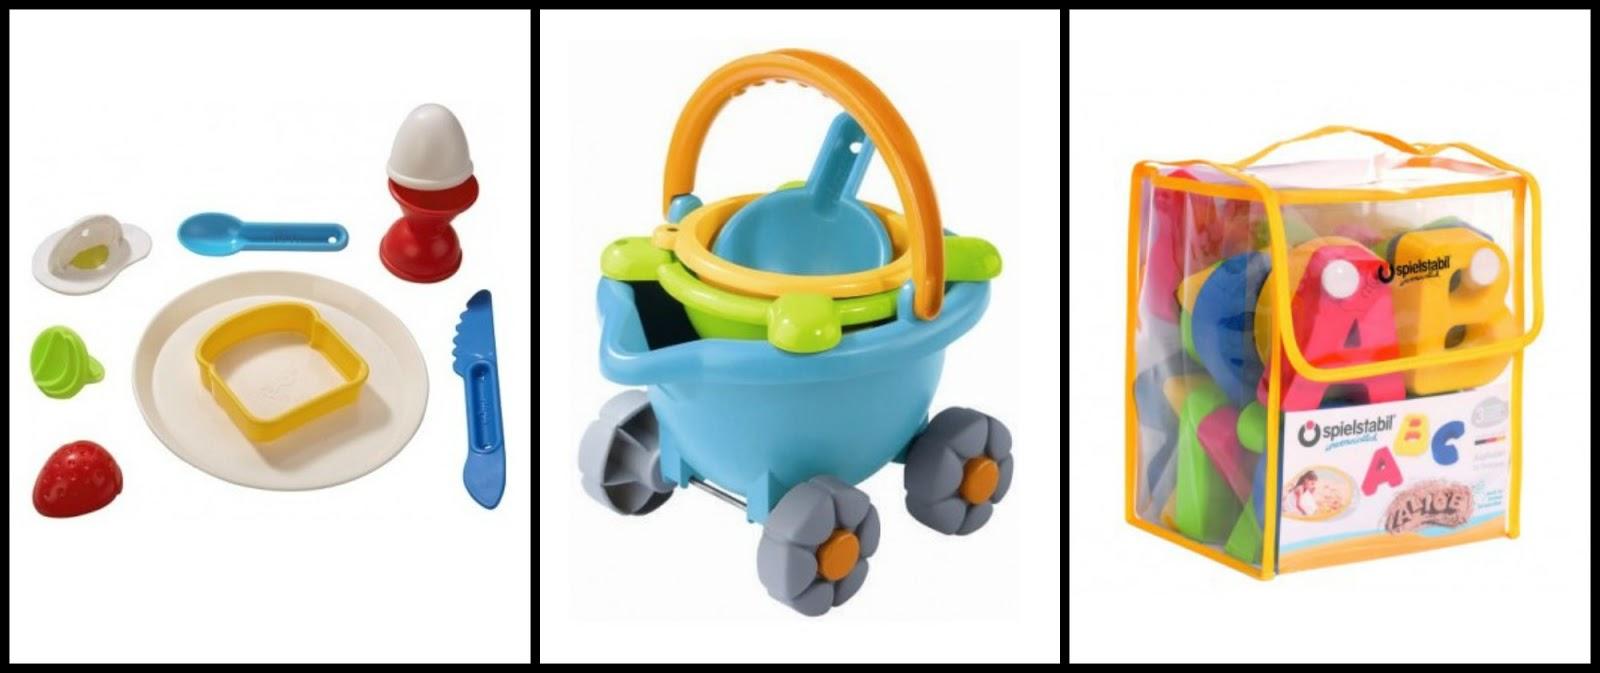 HABA sand toys